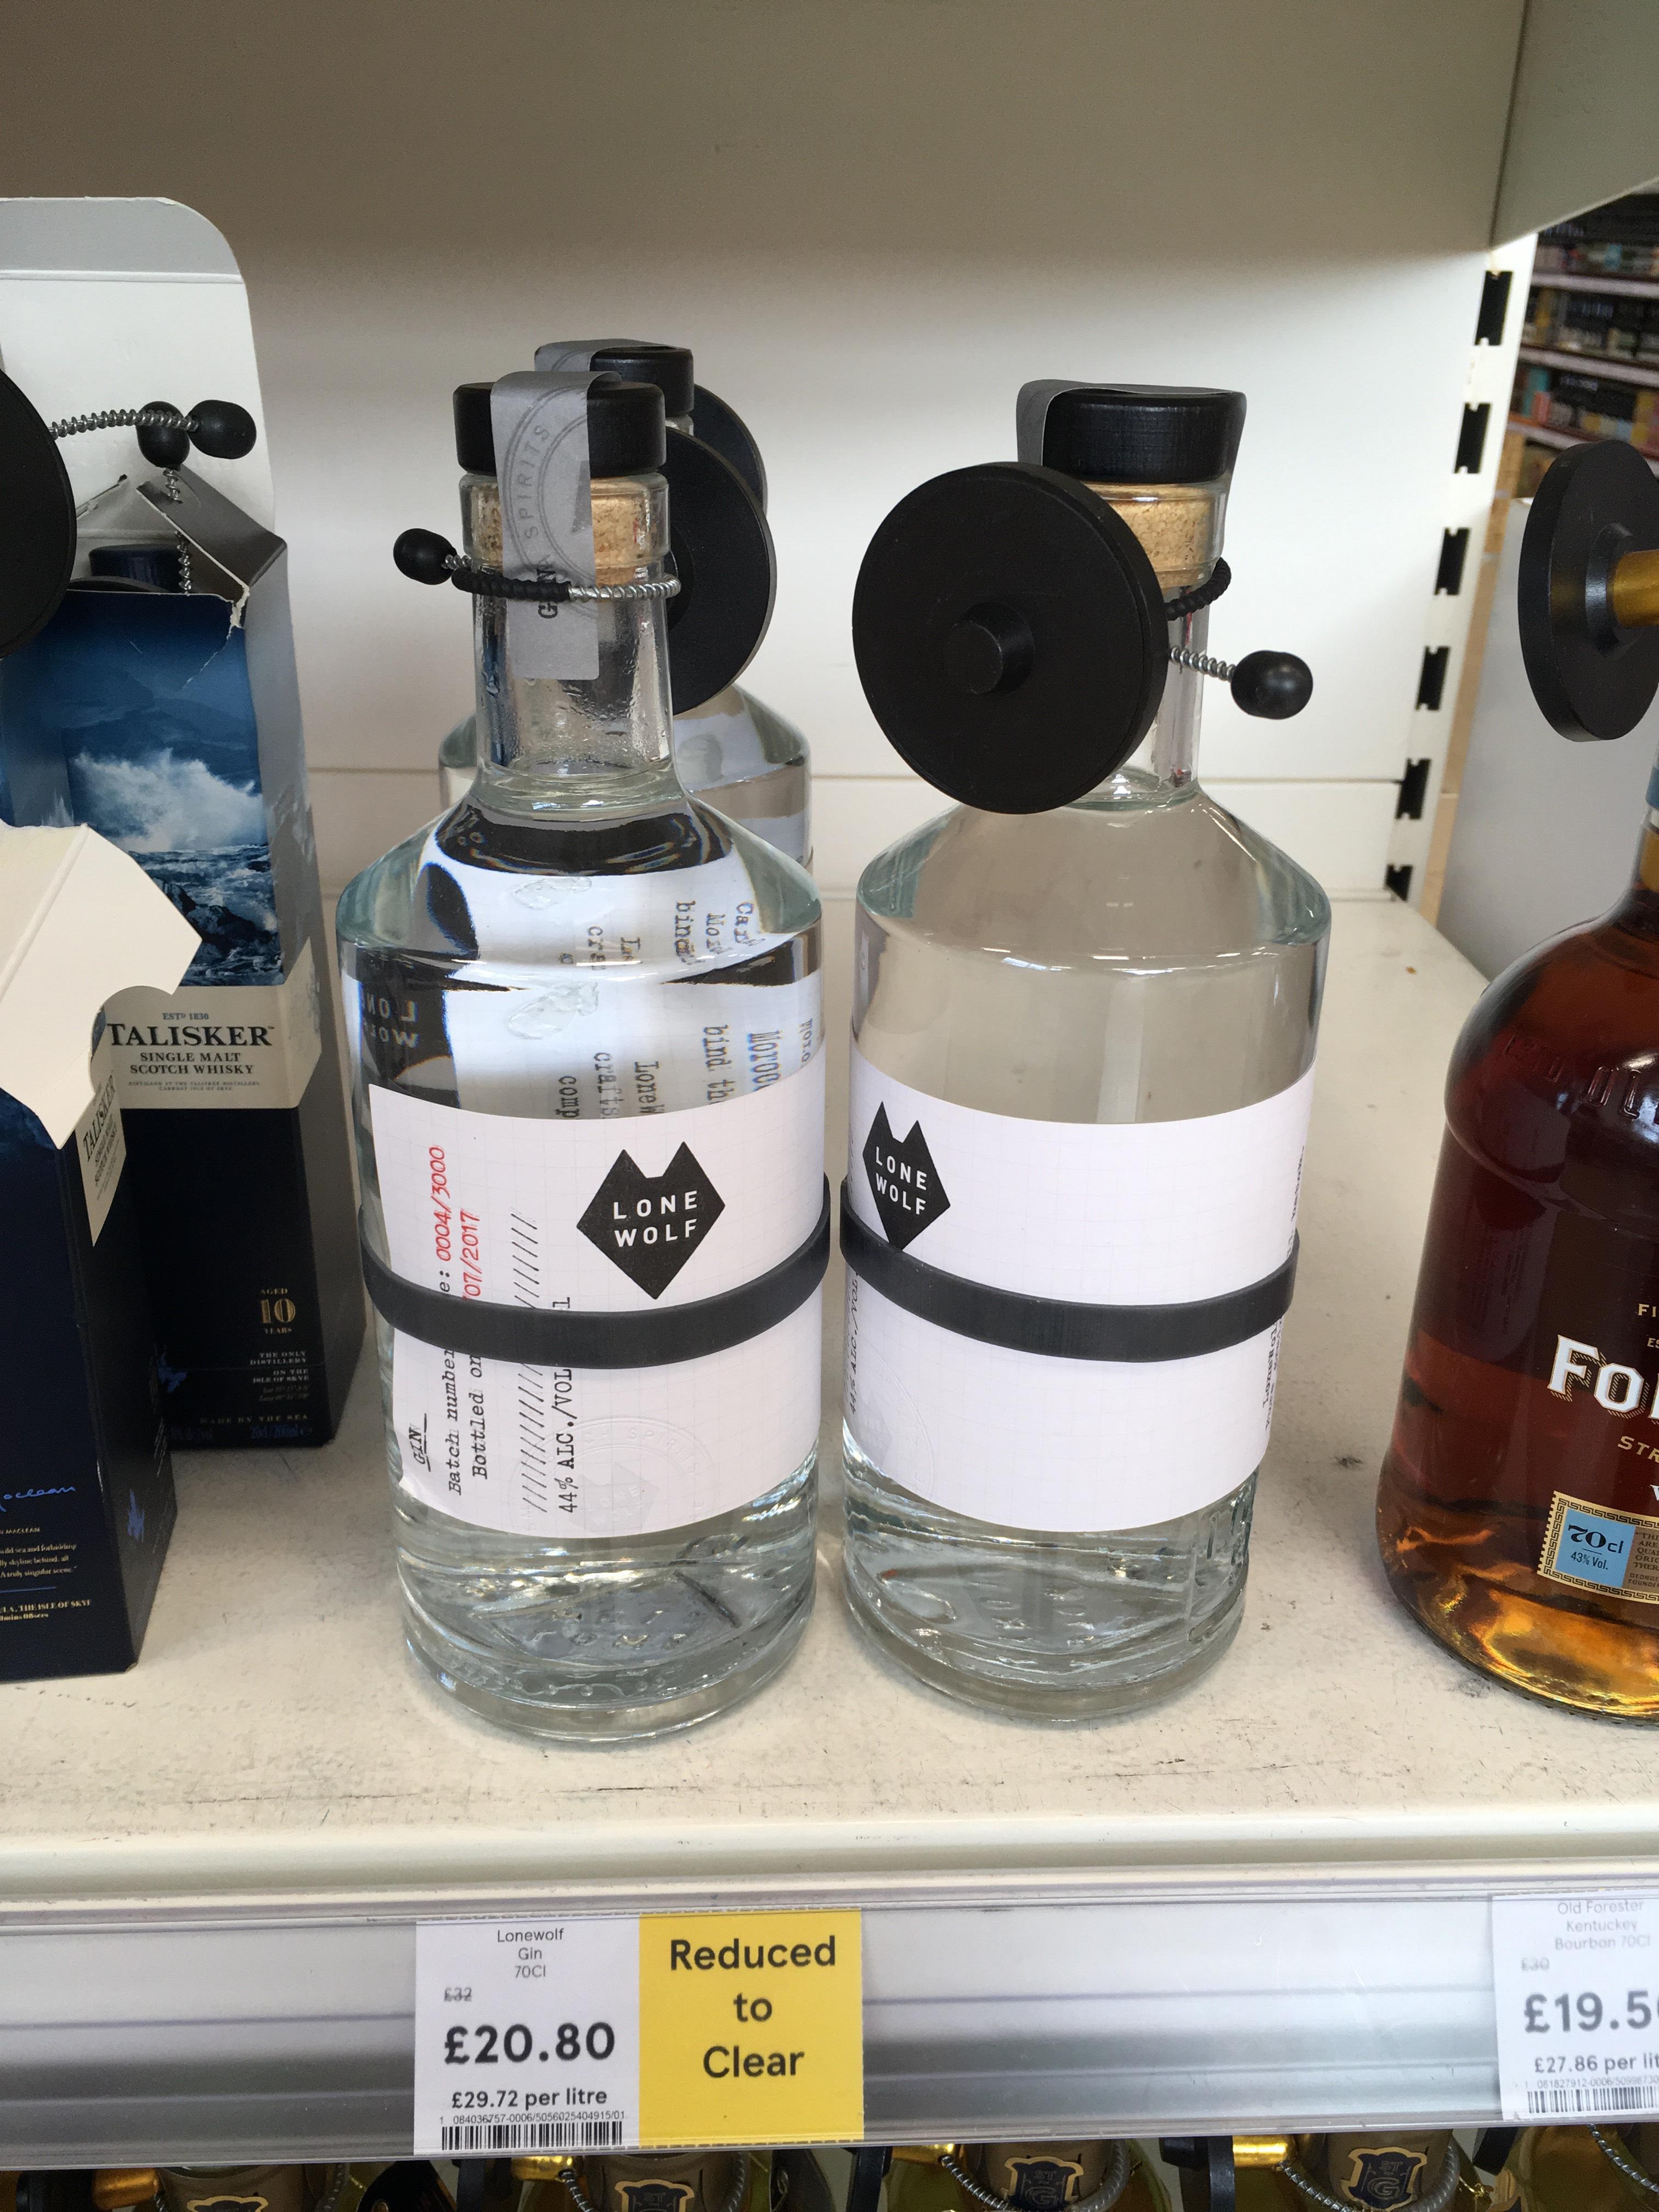 Lone Wolf Gin £20.80 @ Tesco Bellshill